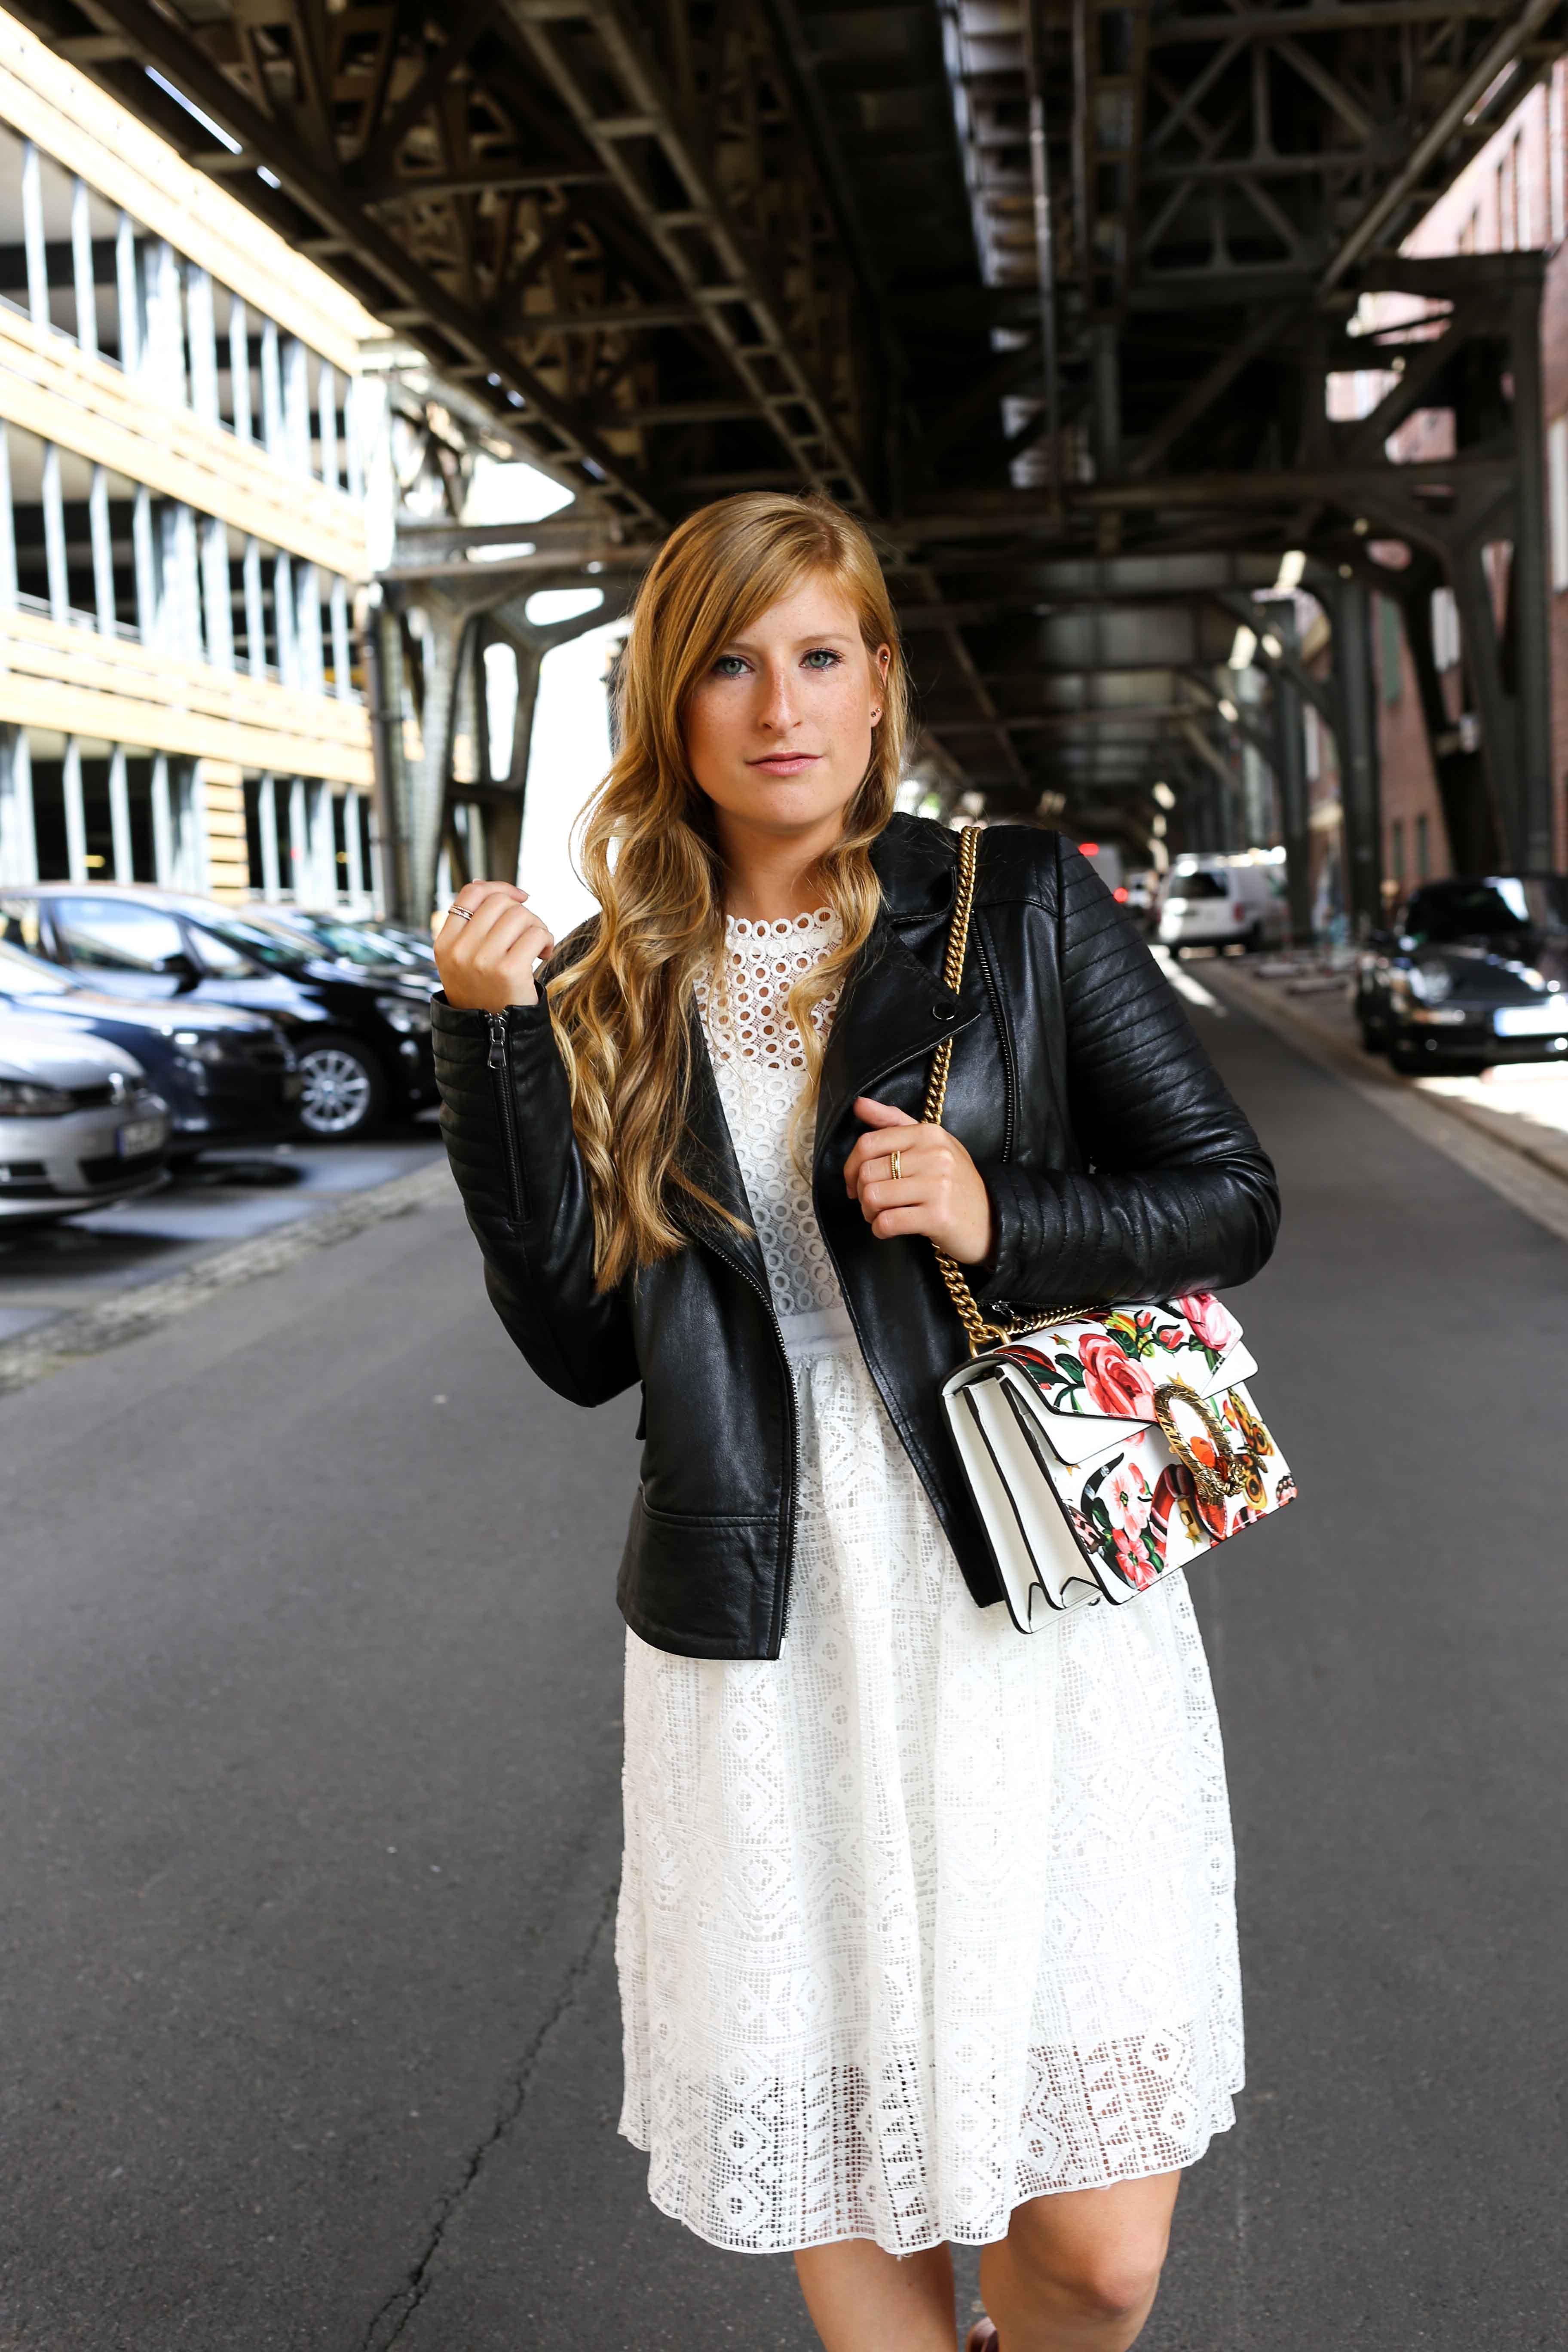 Fashion Week Outfit weißes Spitzenkleid Asos flache Ledersandalen mit Federn kombinieren Lederjacke Modeblog Deutschland Fashion Blogger OOTD 2